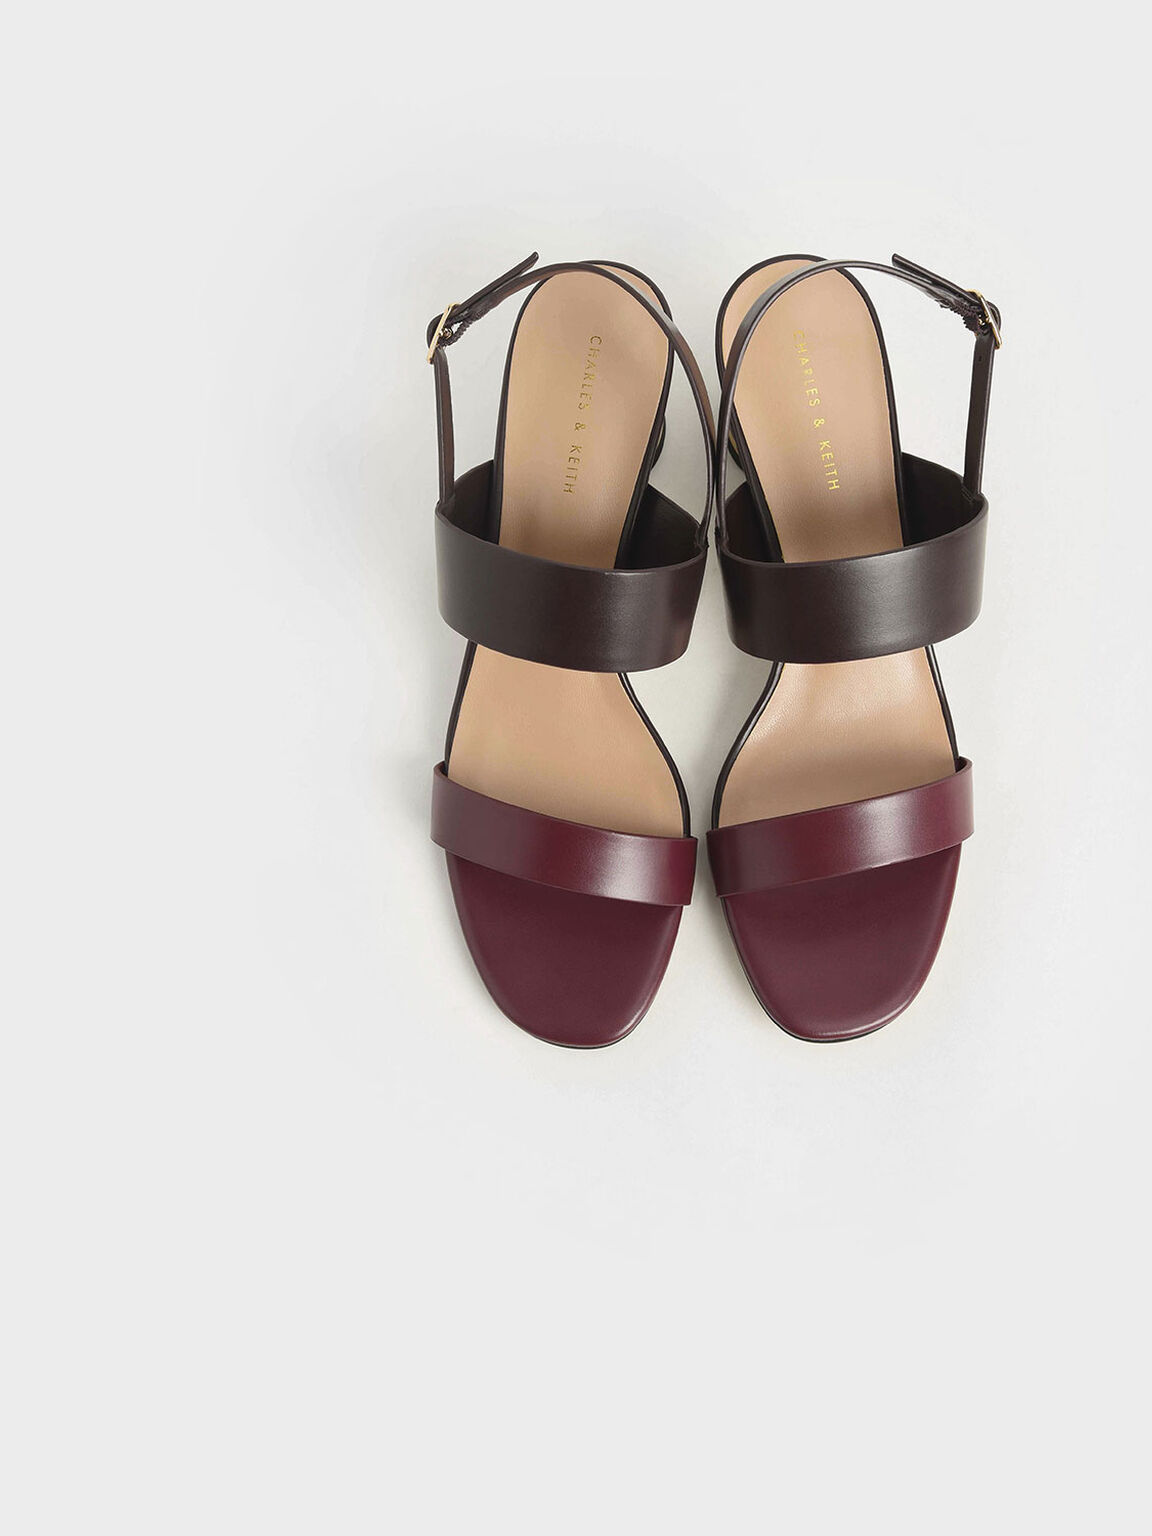 Two-Tone Cylindrical Heel Sandals, Burgundy, hi-res